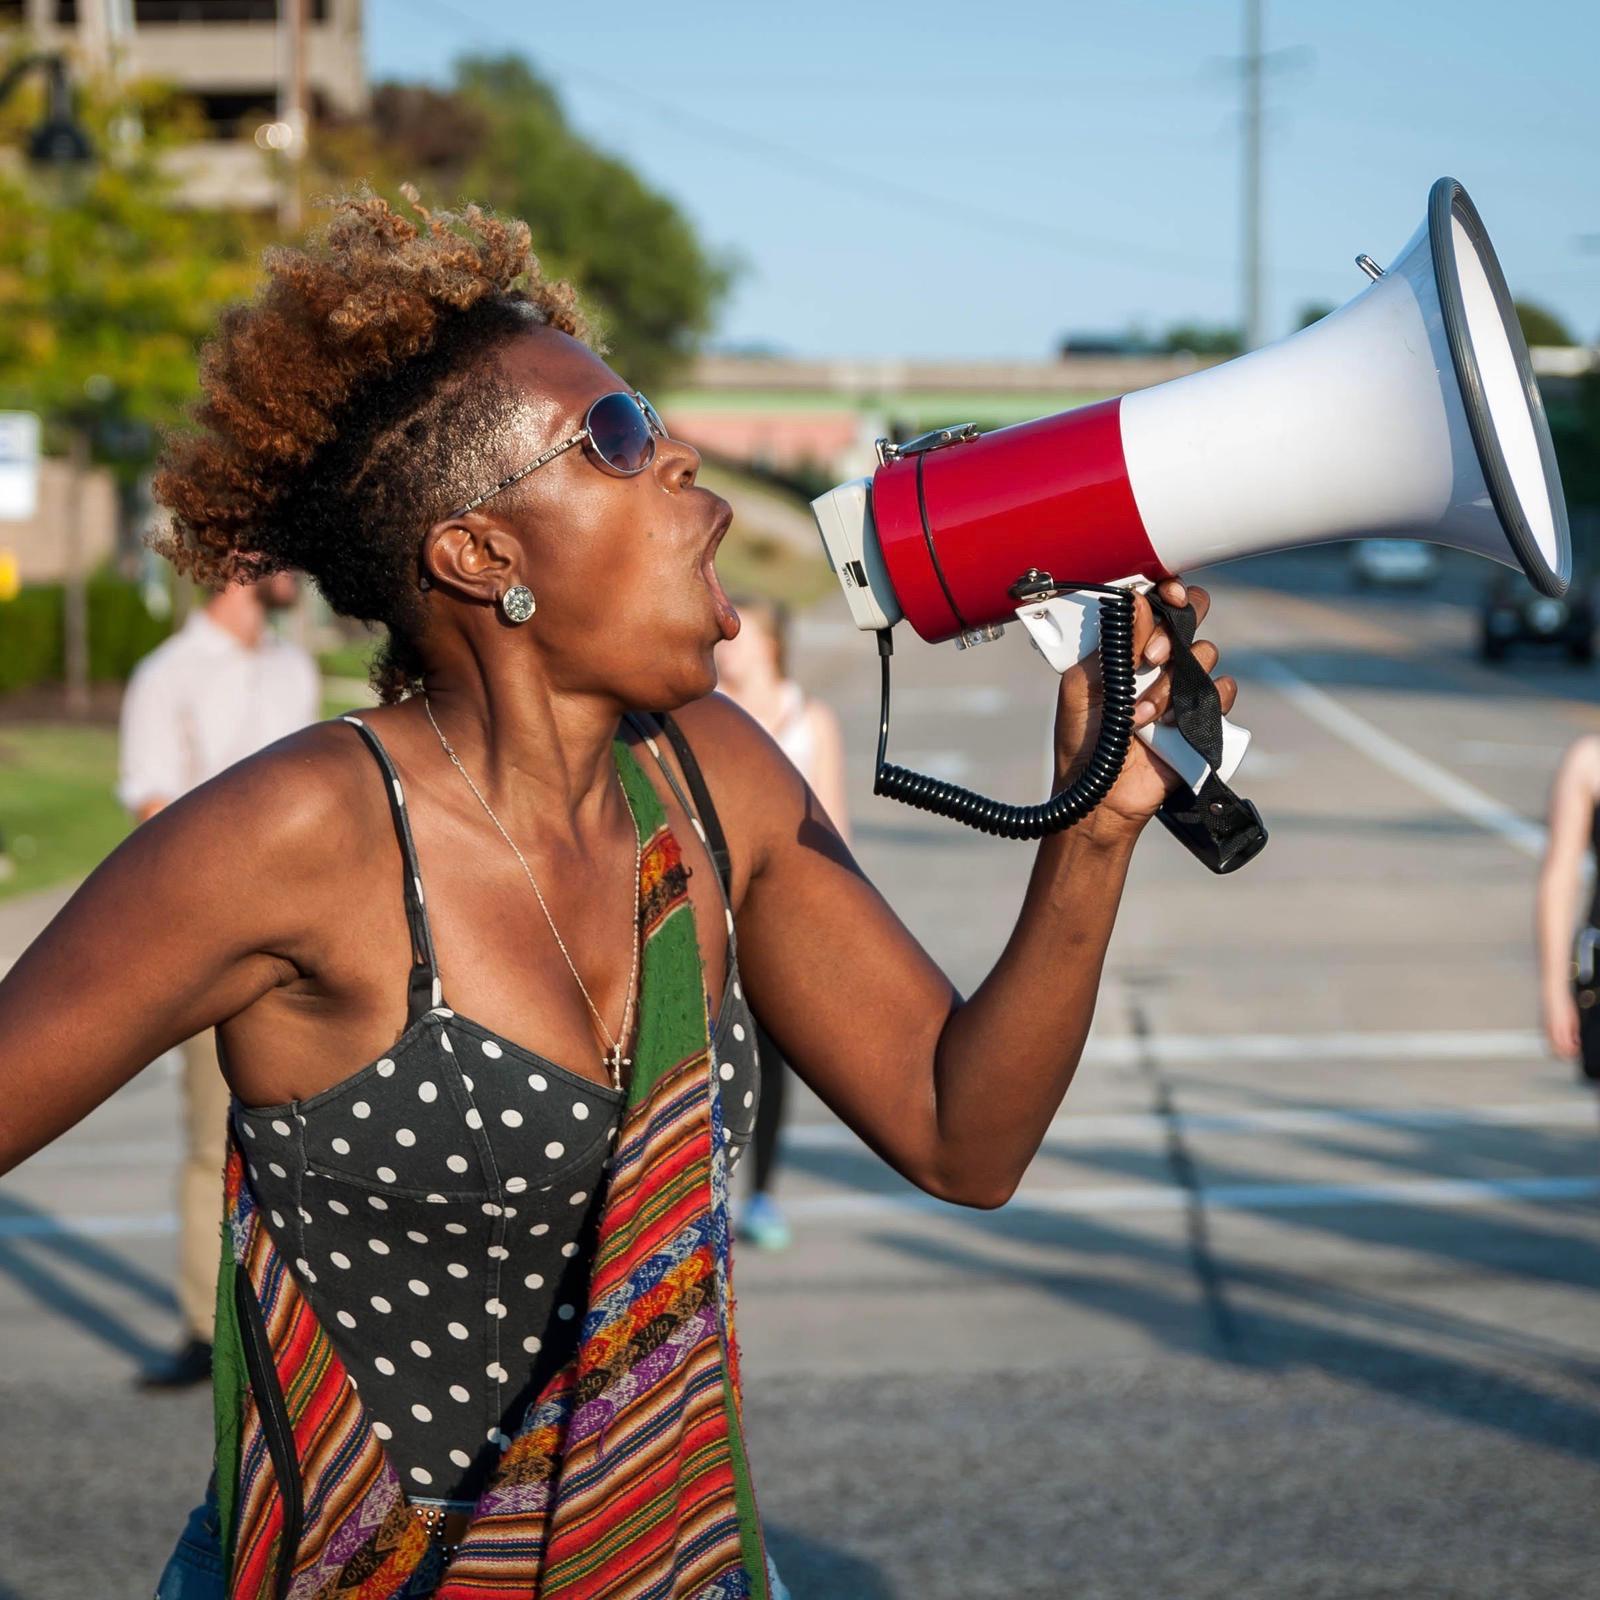 #StockleyVerdict: ACLU Sues, St. Louis Aldermen Support A Criminal, Protests Continue [VIDEO]